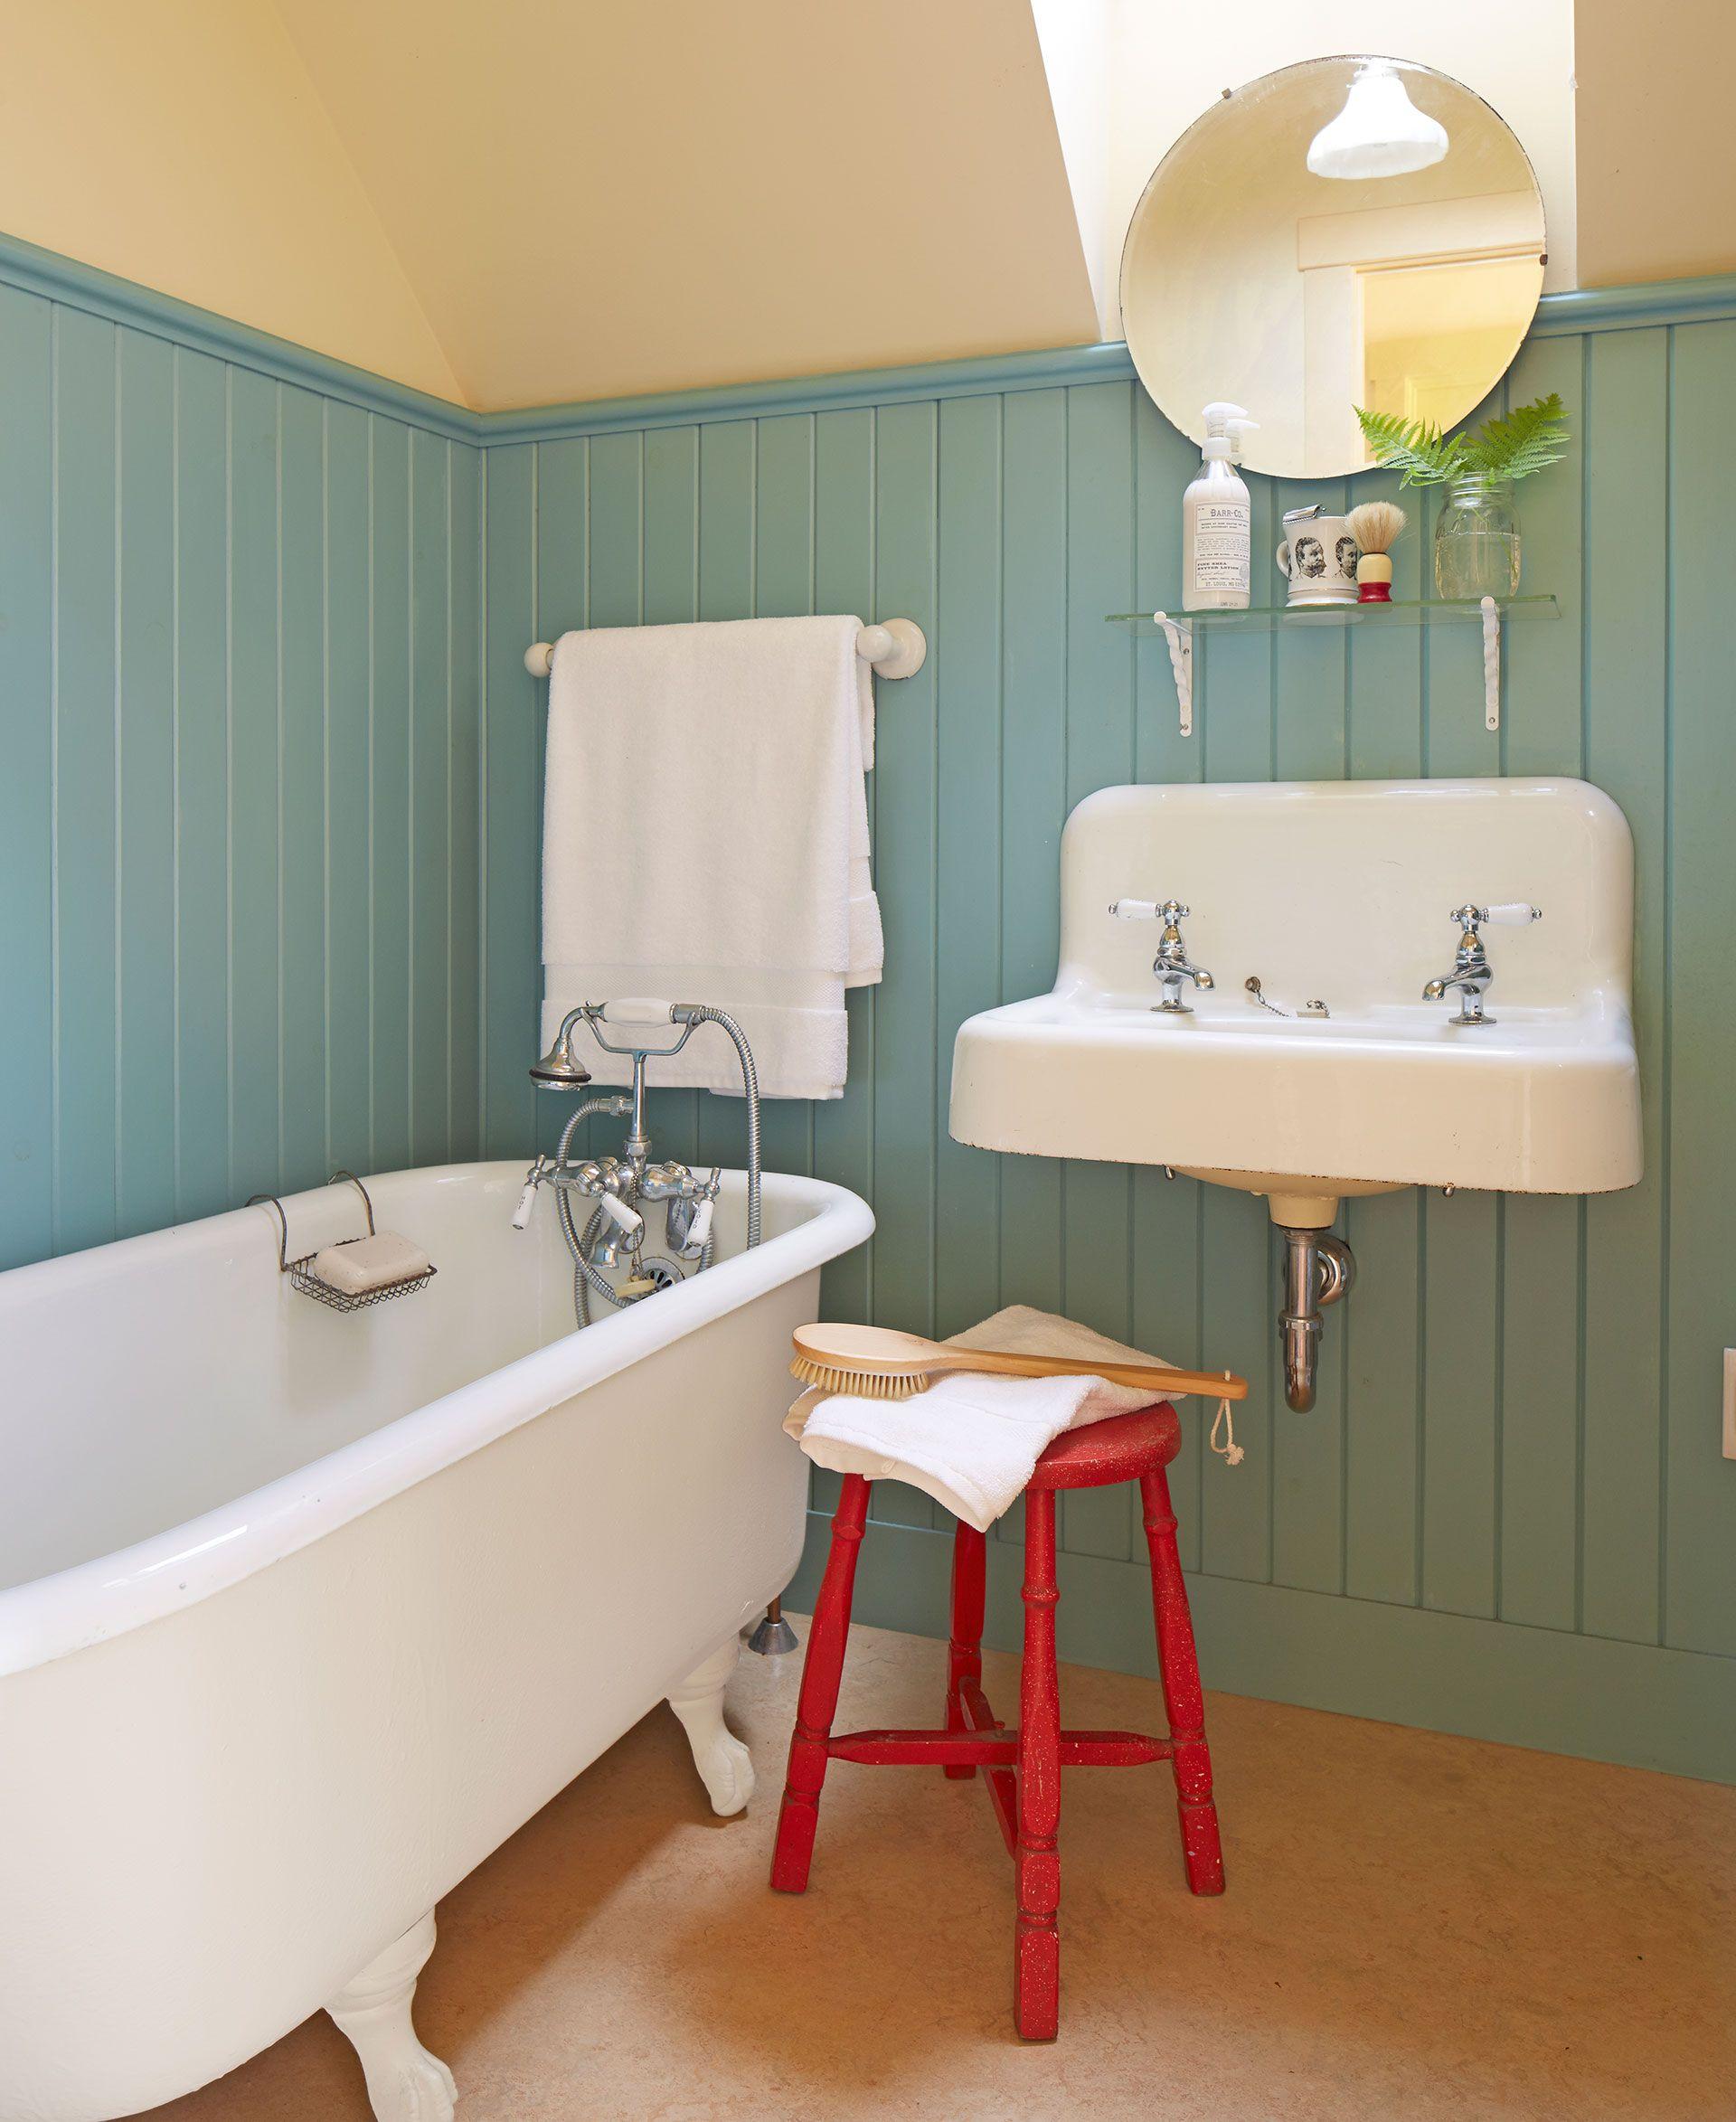 80 inspiring bathroom decorating ideas - Bathroom Designs Using Beadboard